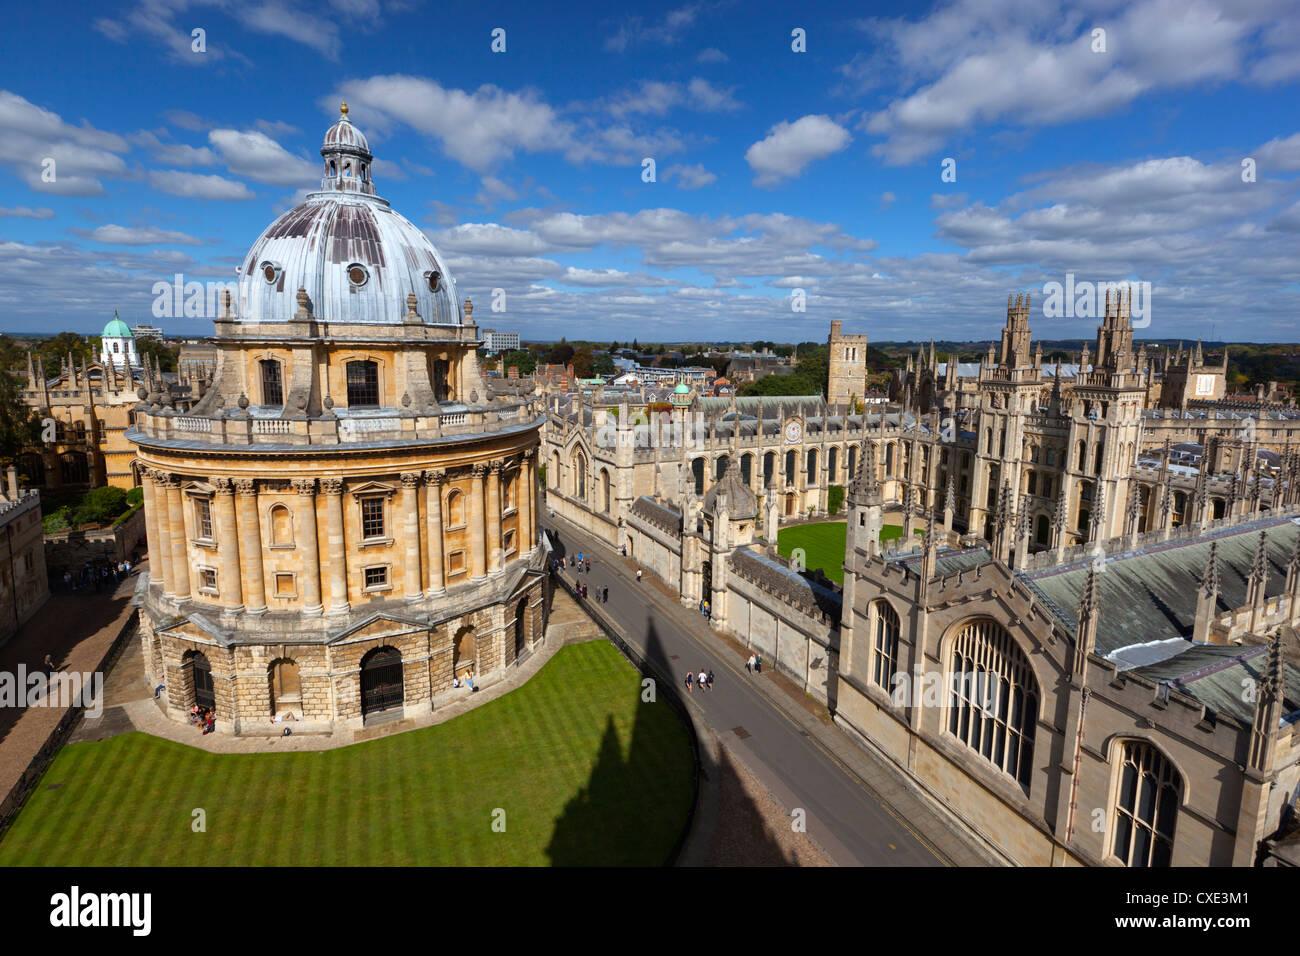 Blick über Radcliffe Camera und All Souls College, Oxford, Oxfordshire, England Stockbild